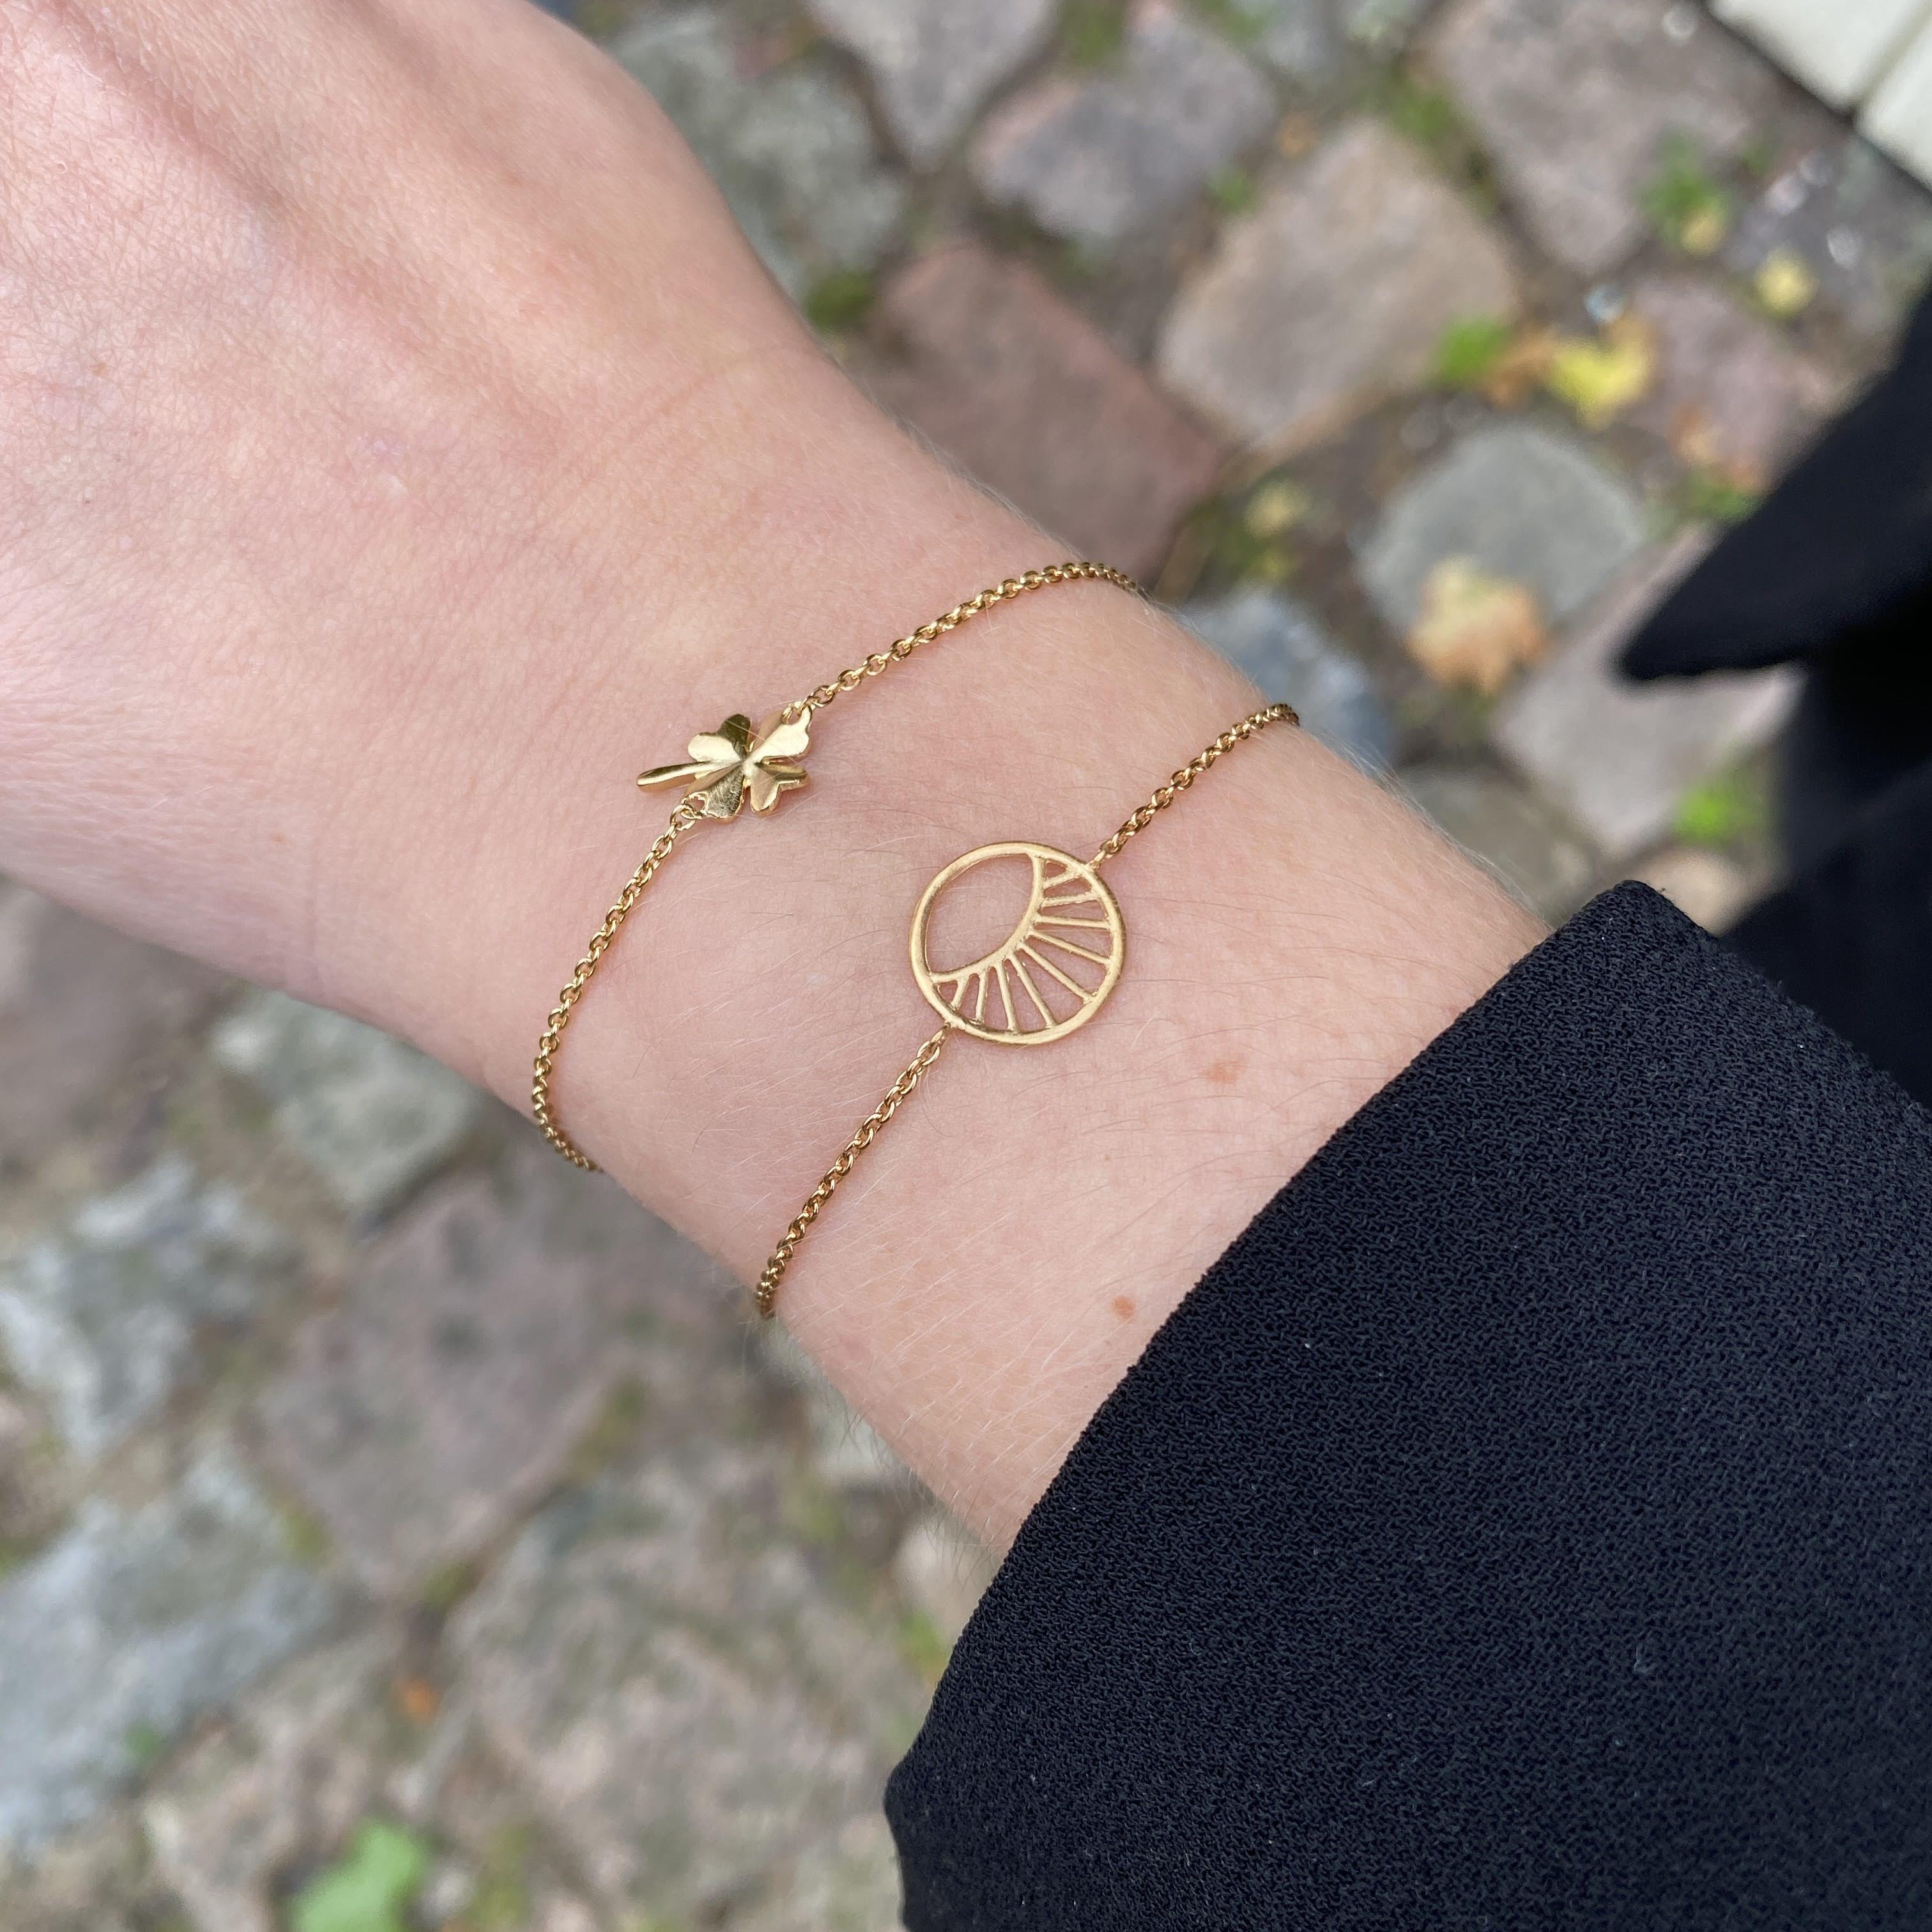 Small Daylight bracelet von Pernille Corydon in Silber Sterling 925| Matt,Blank